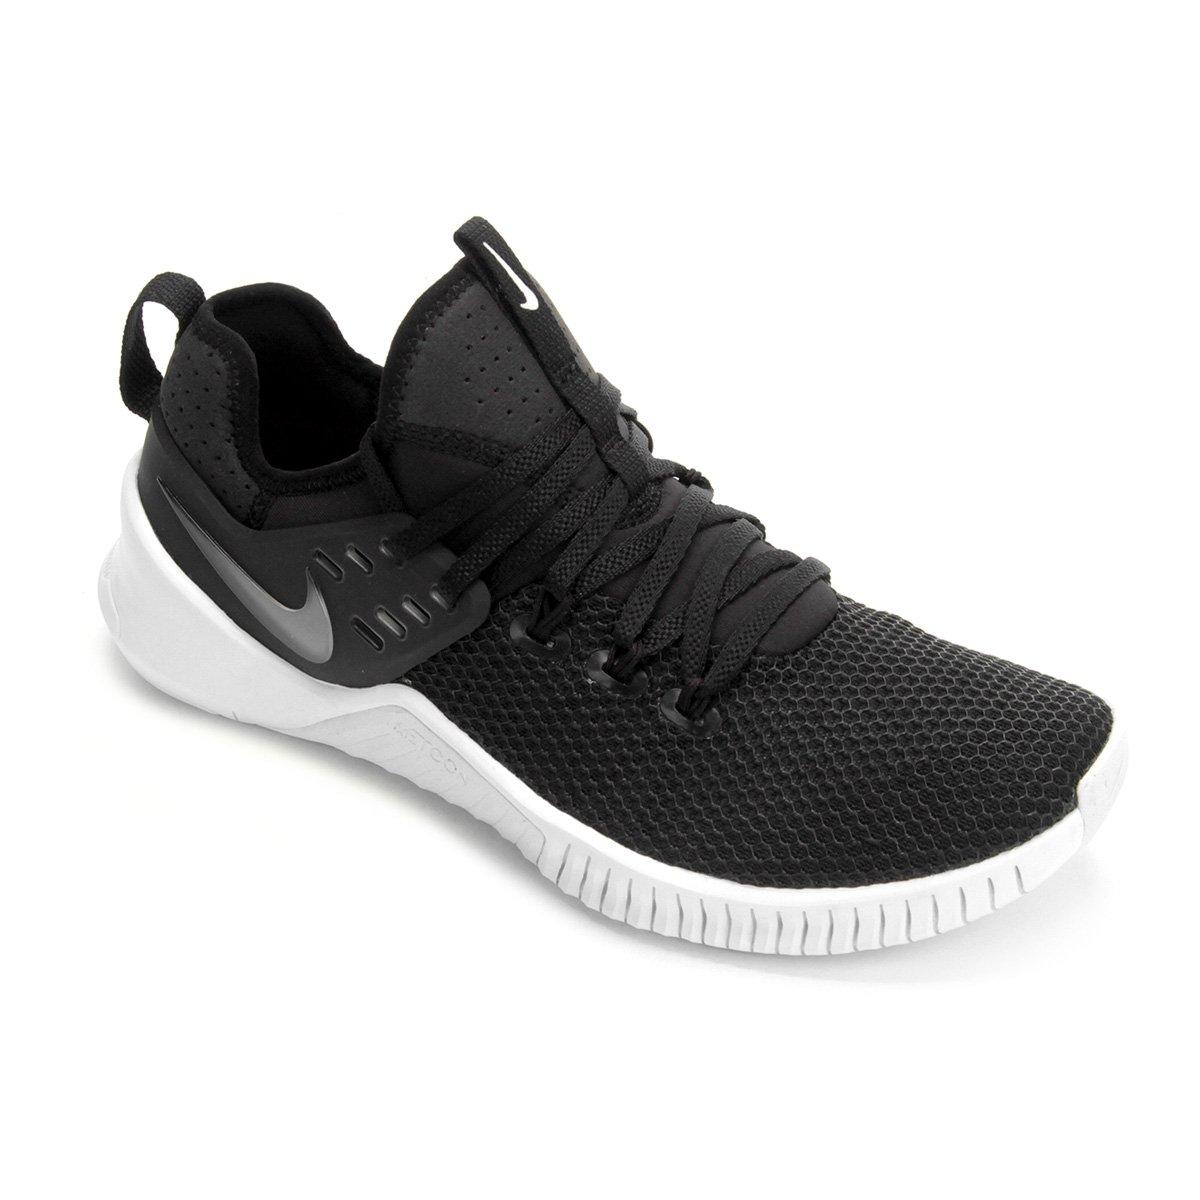 Tênis Nike Netsapatos Free Metcon Masculino Compre Agora Netsapatos Nike 6ae31c